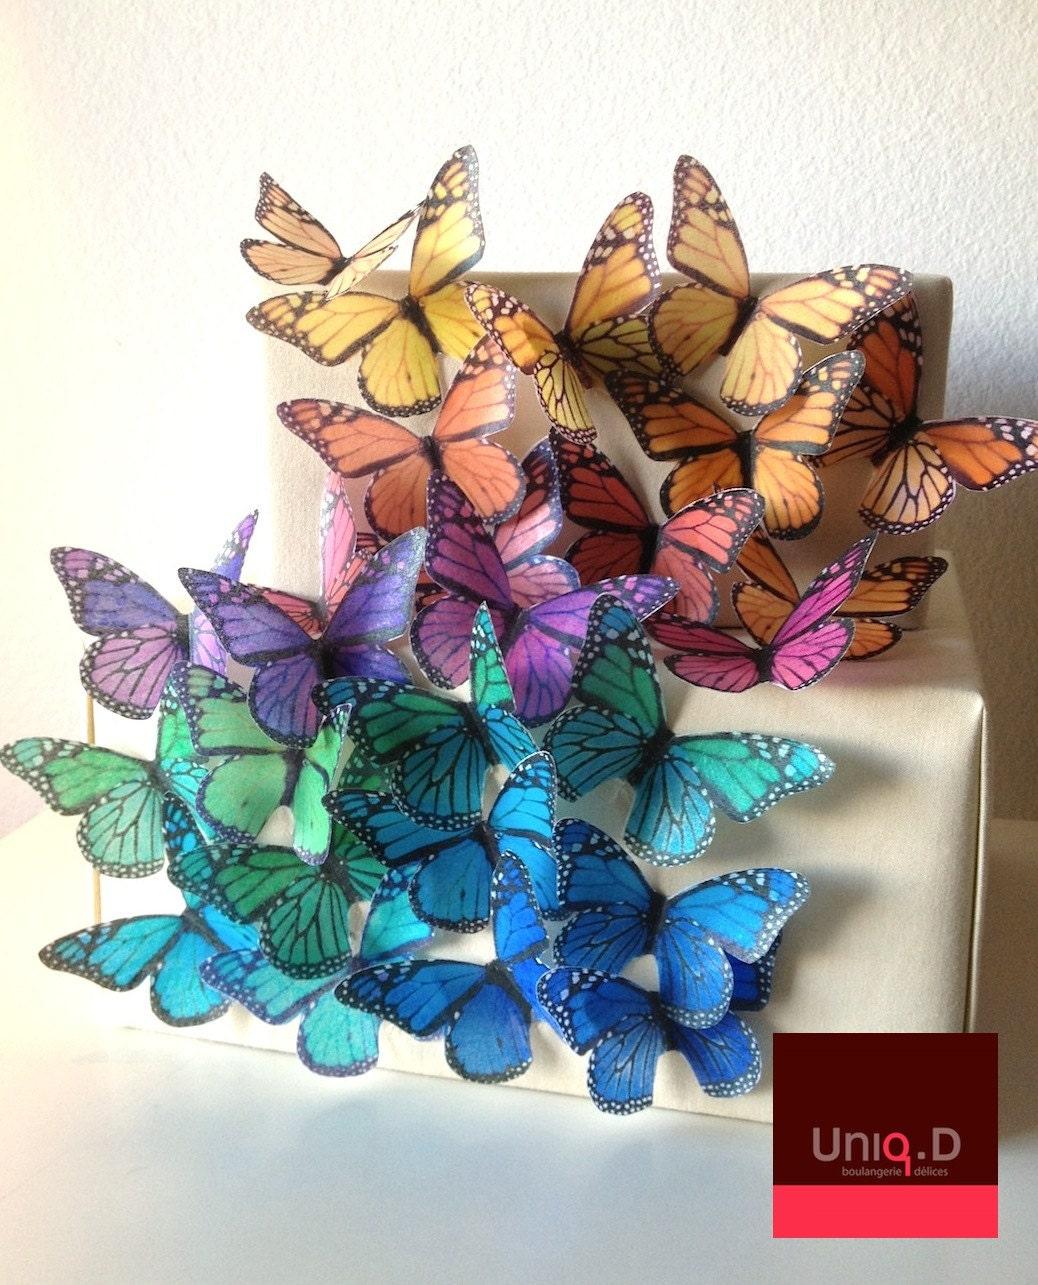 Vintage Rainbow Cake Decoration Edible : BUY 70 get 10 FREE rainbow butterflies wedding by uniqdots